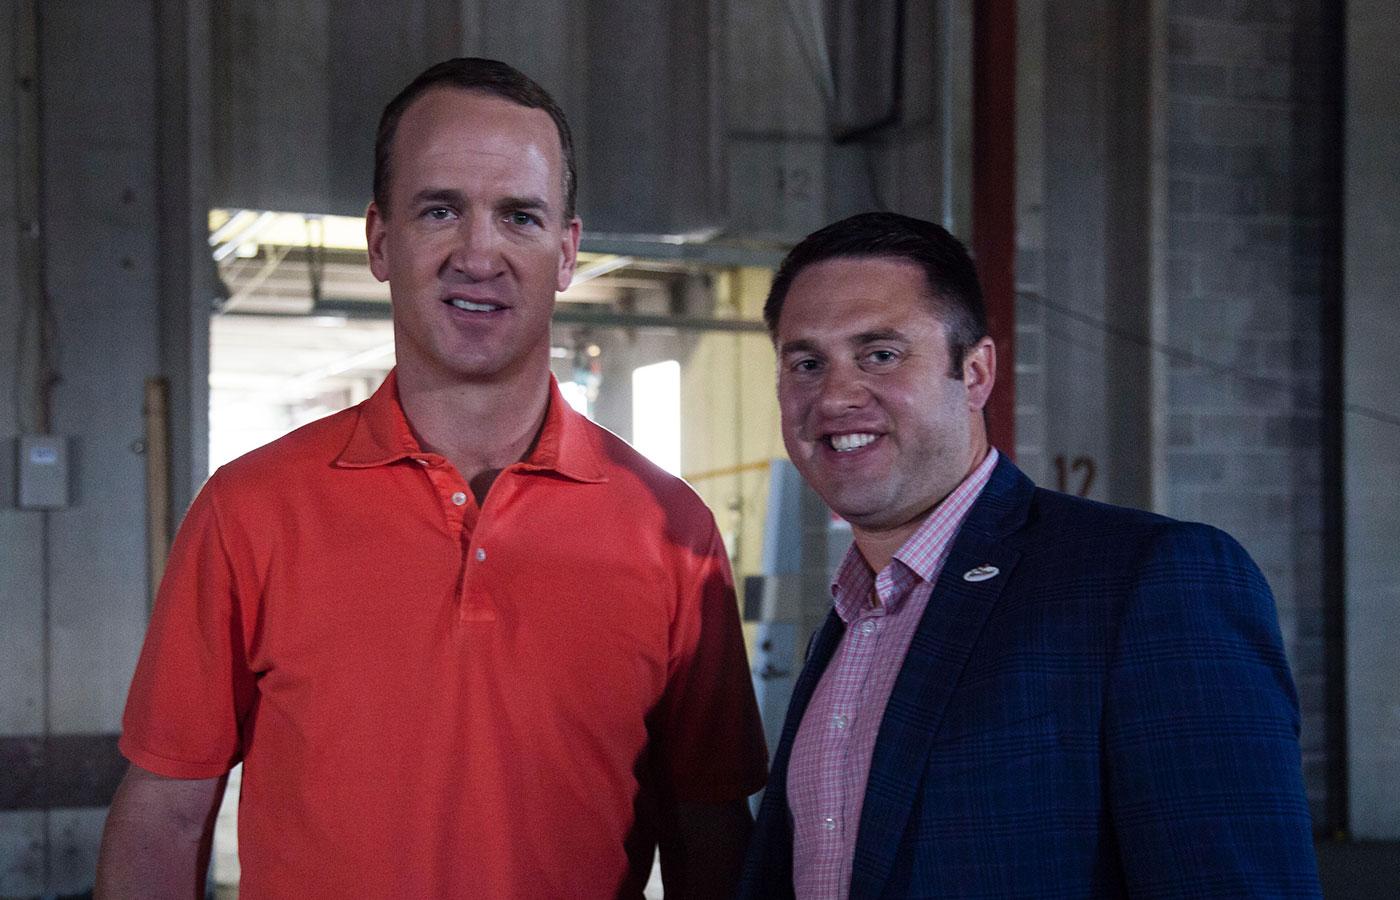 DeSales alum Dedan Brozino with Peyton Manning